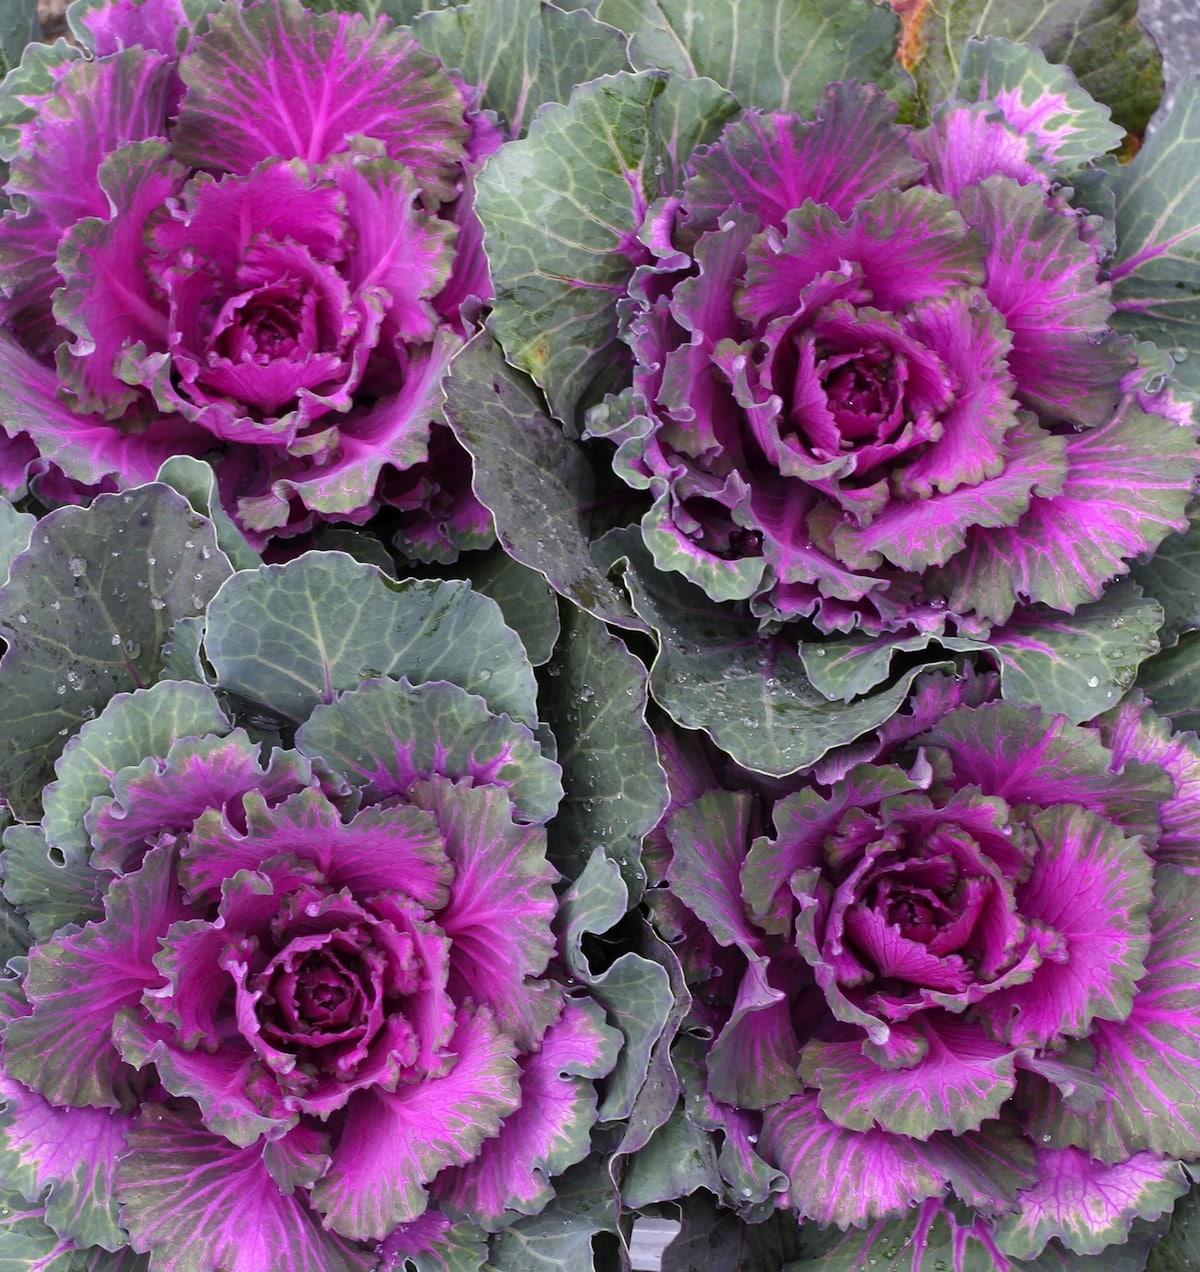 Ornamental Cabbage Kale Sloat Garden Center